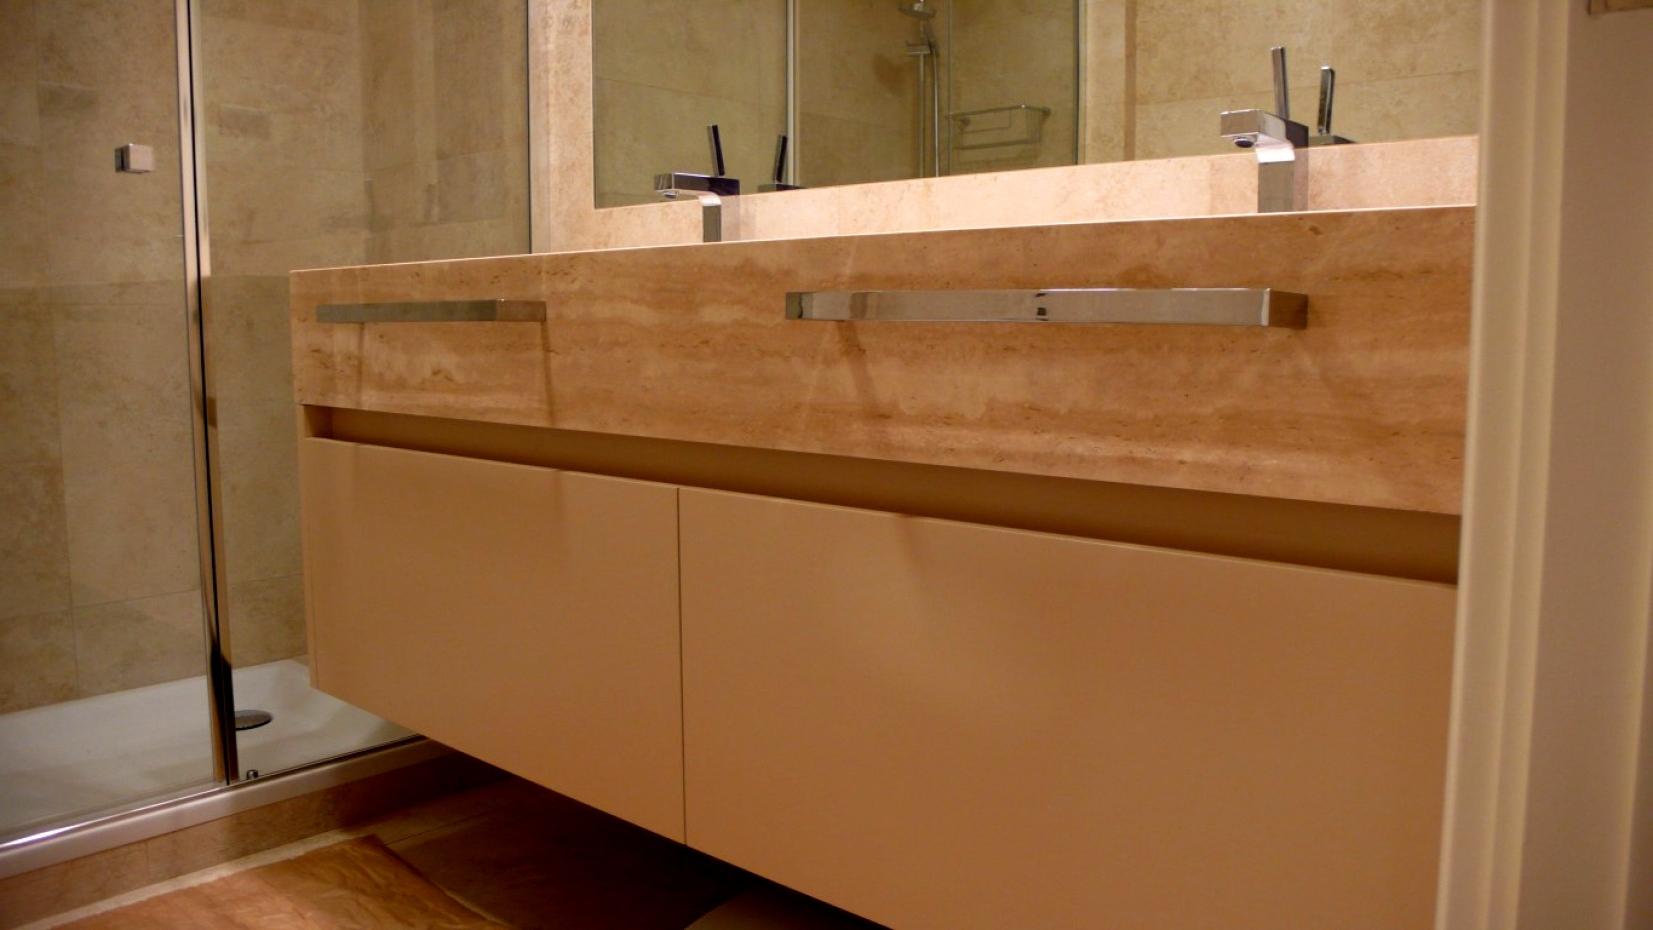 Muebles De Baño De Madera Drdp Impresionante De Muebles Para Bano A Medida Ba C3 B1o 1 3